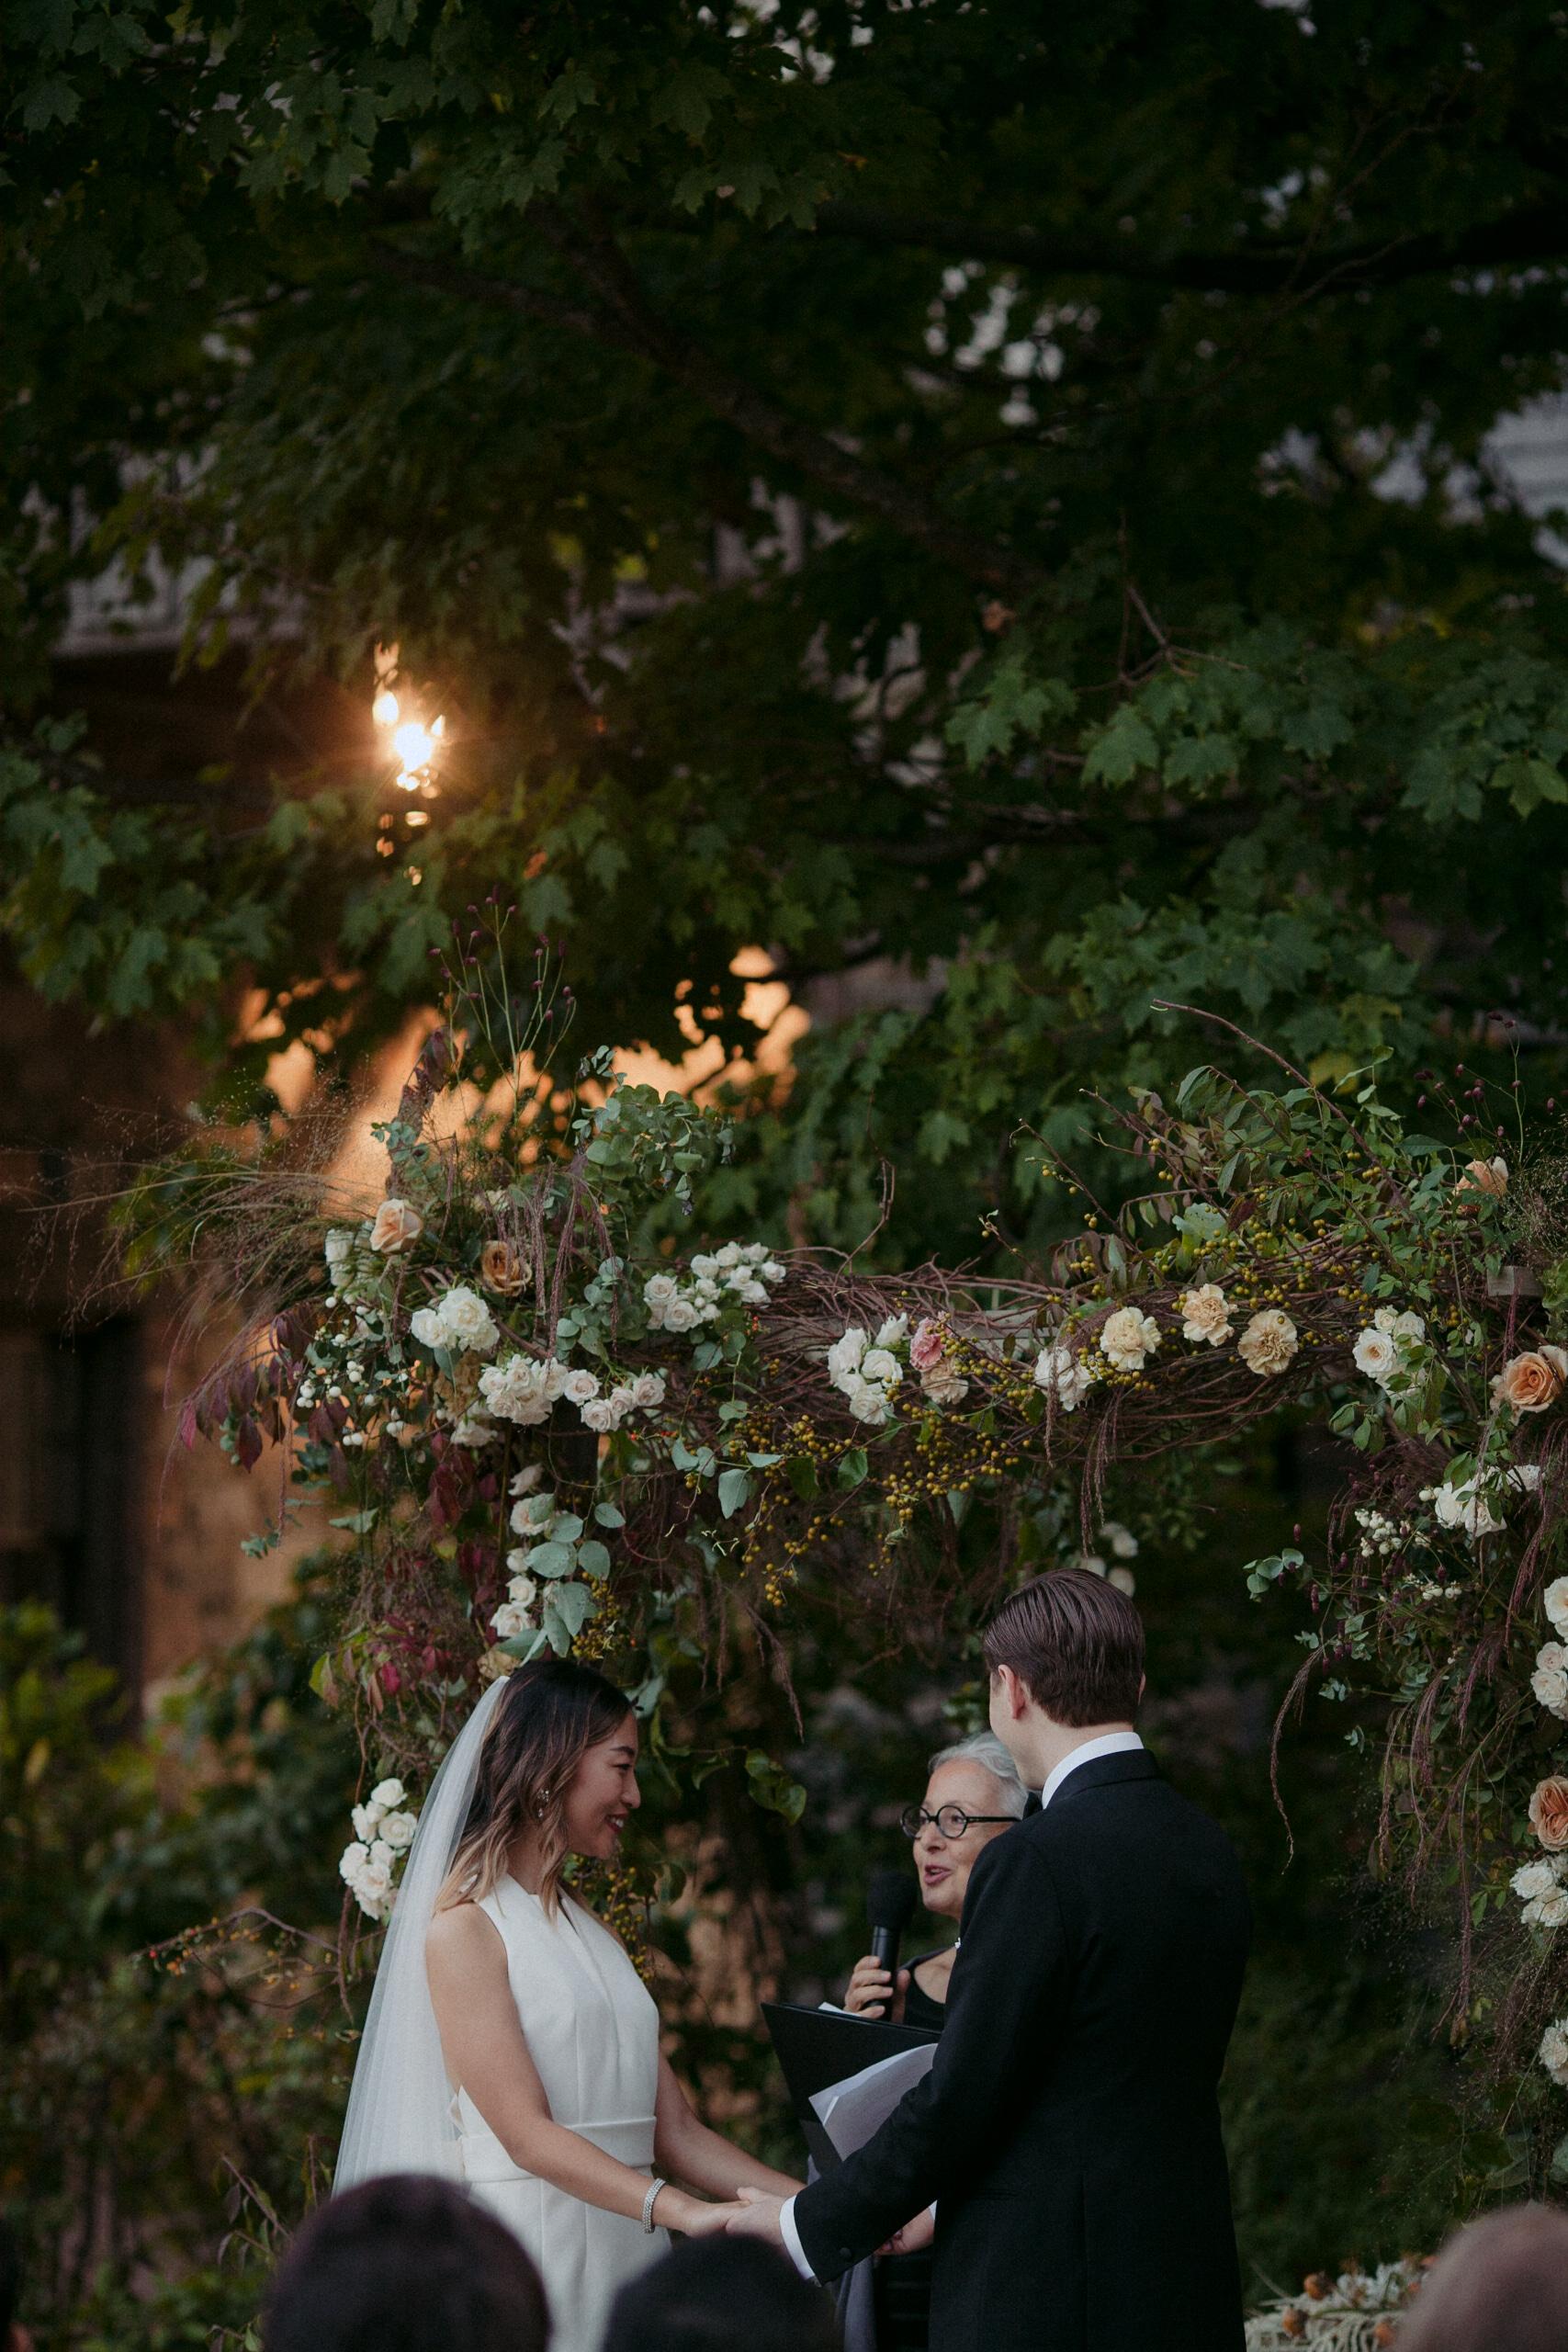 Tall & Small Events NYC, S+S, Stylish Modern, Jewish-Korean Interfaith Designer New York Real Wedding at Blue Hill at Stone Barns, Tarrytown, NY. Photo: Les Loups